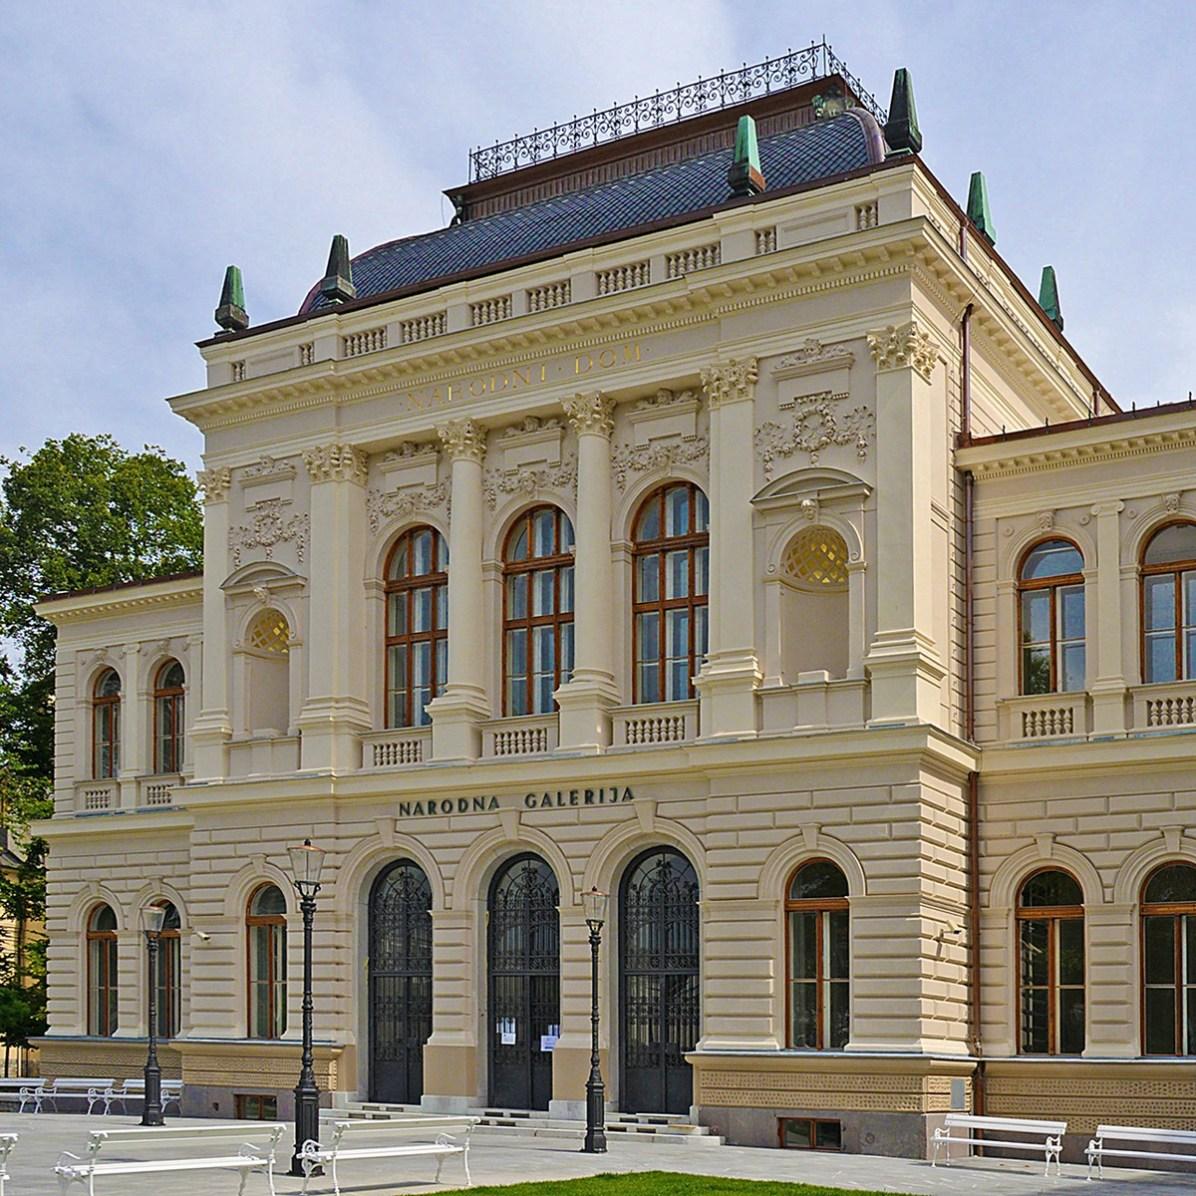 Foto: www.visitljubljana.com